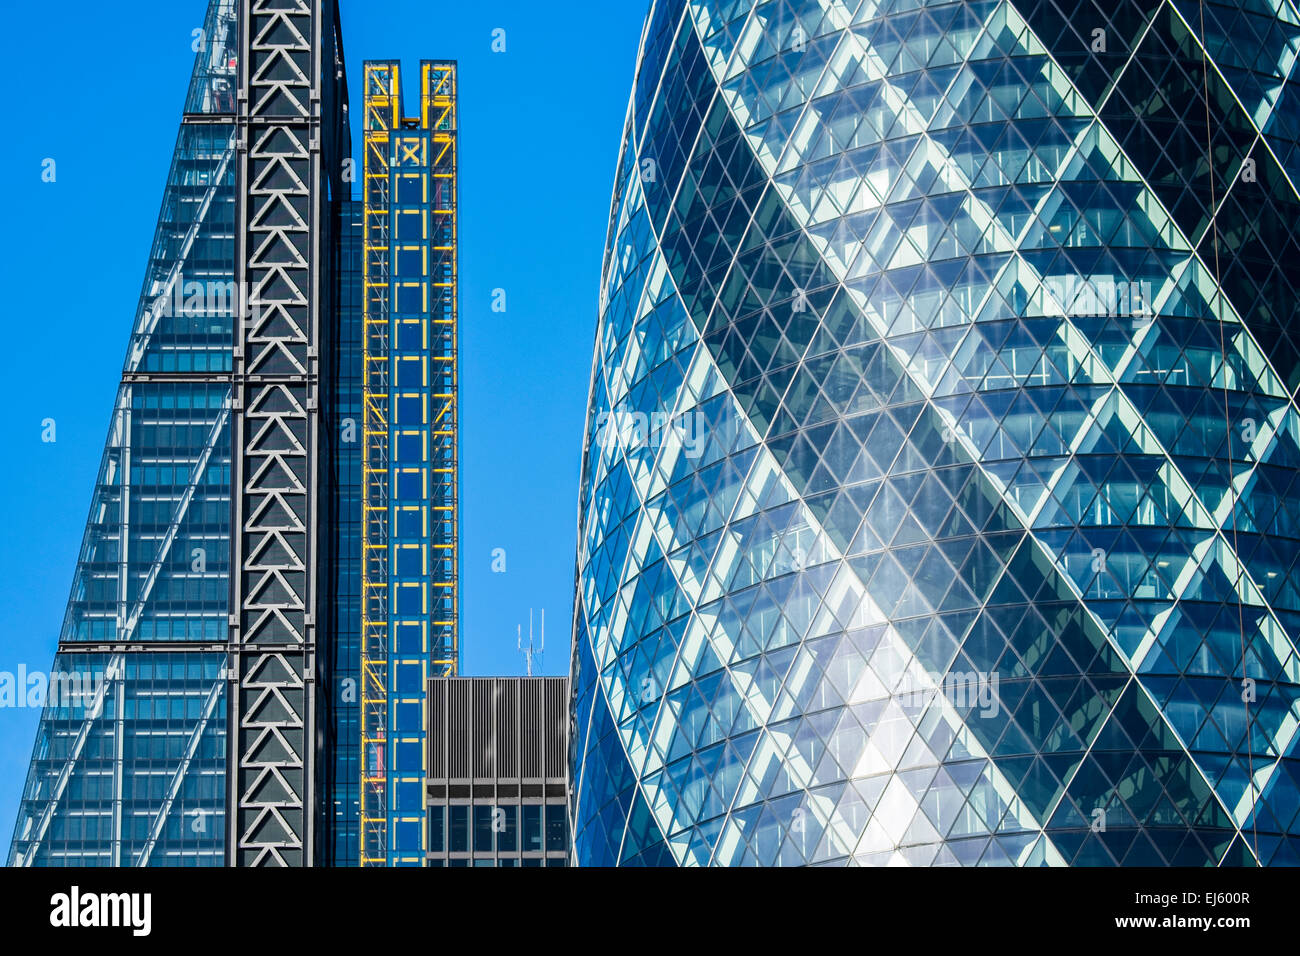 Leadenhall building & The Gherkin - City of London - Stock Image